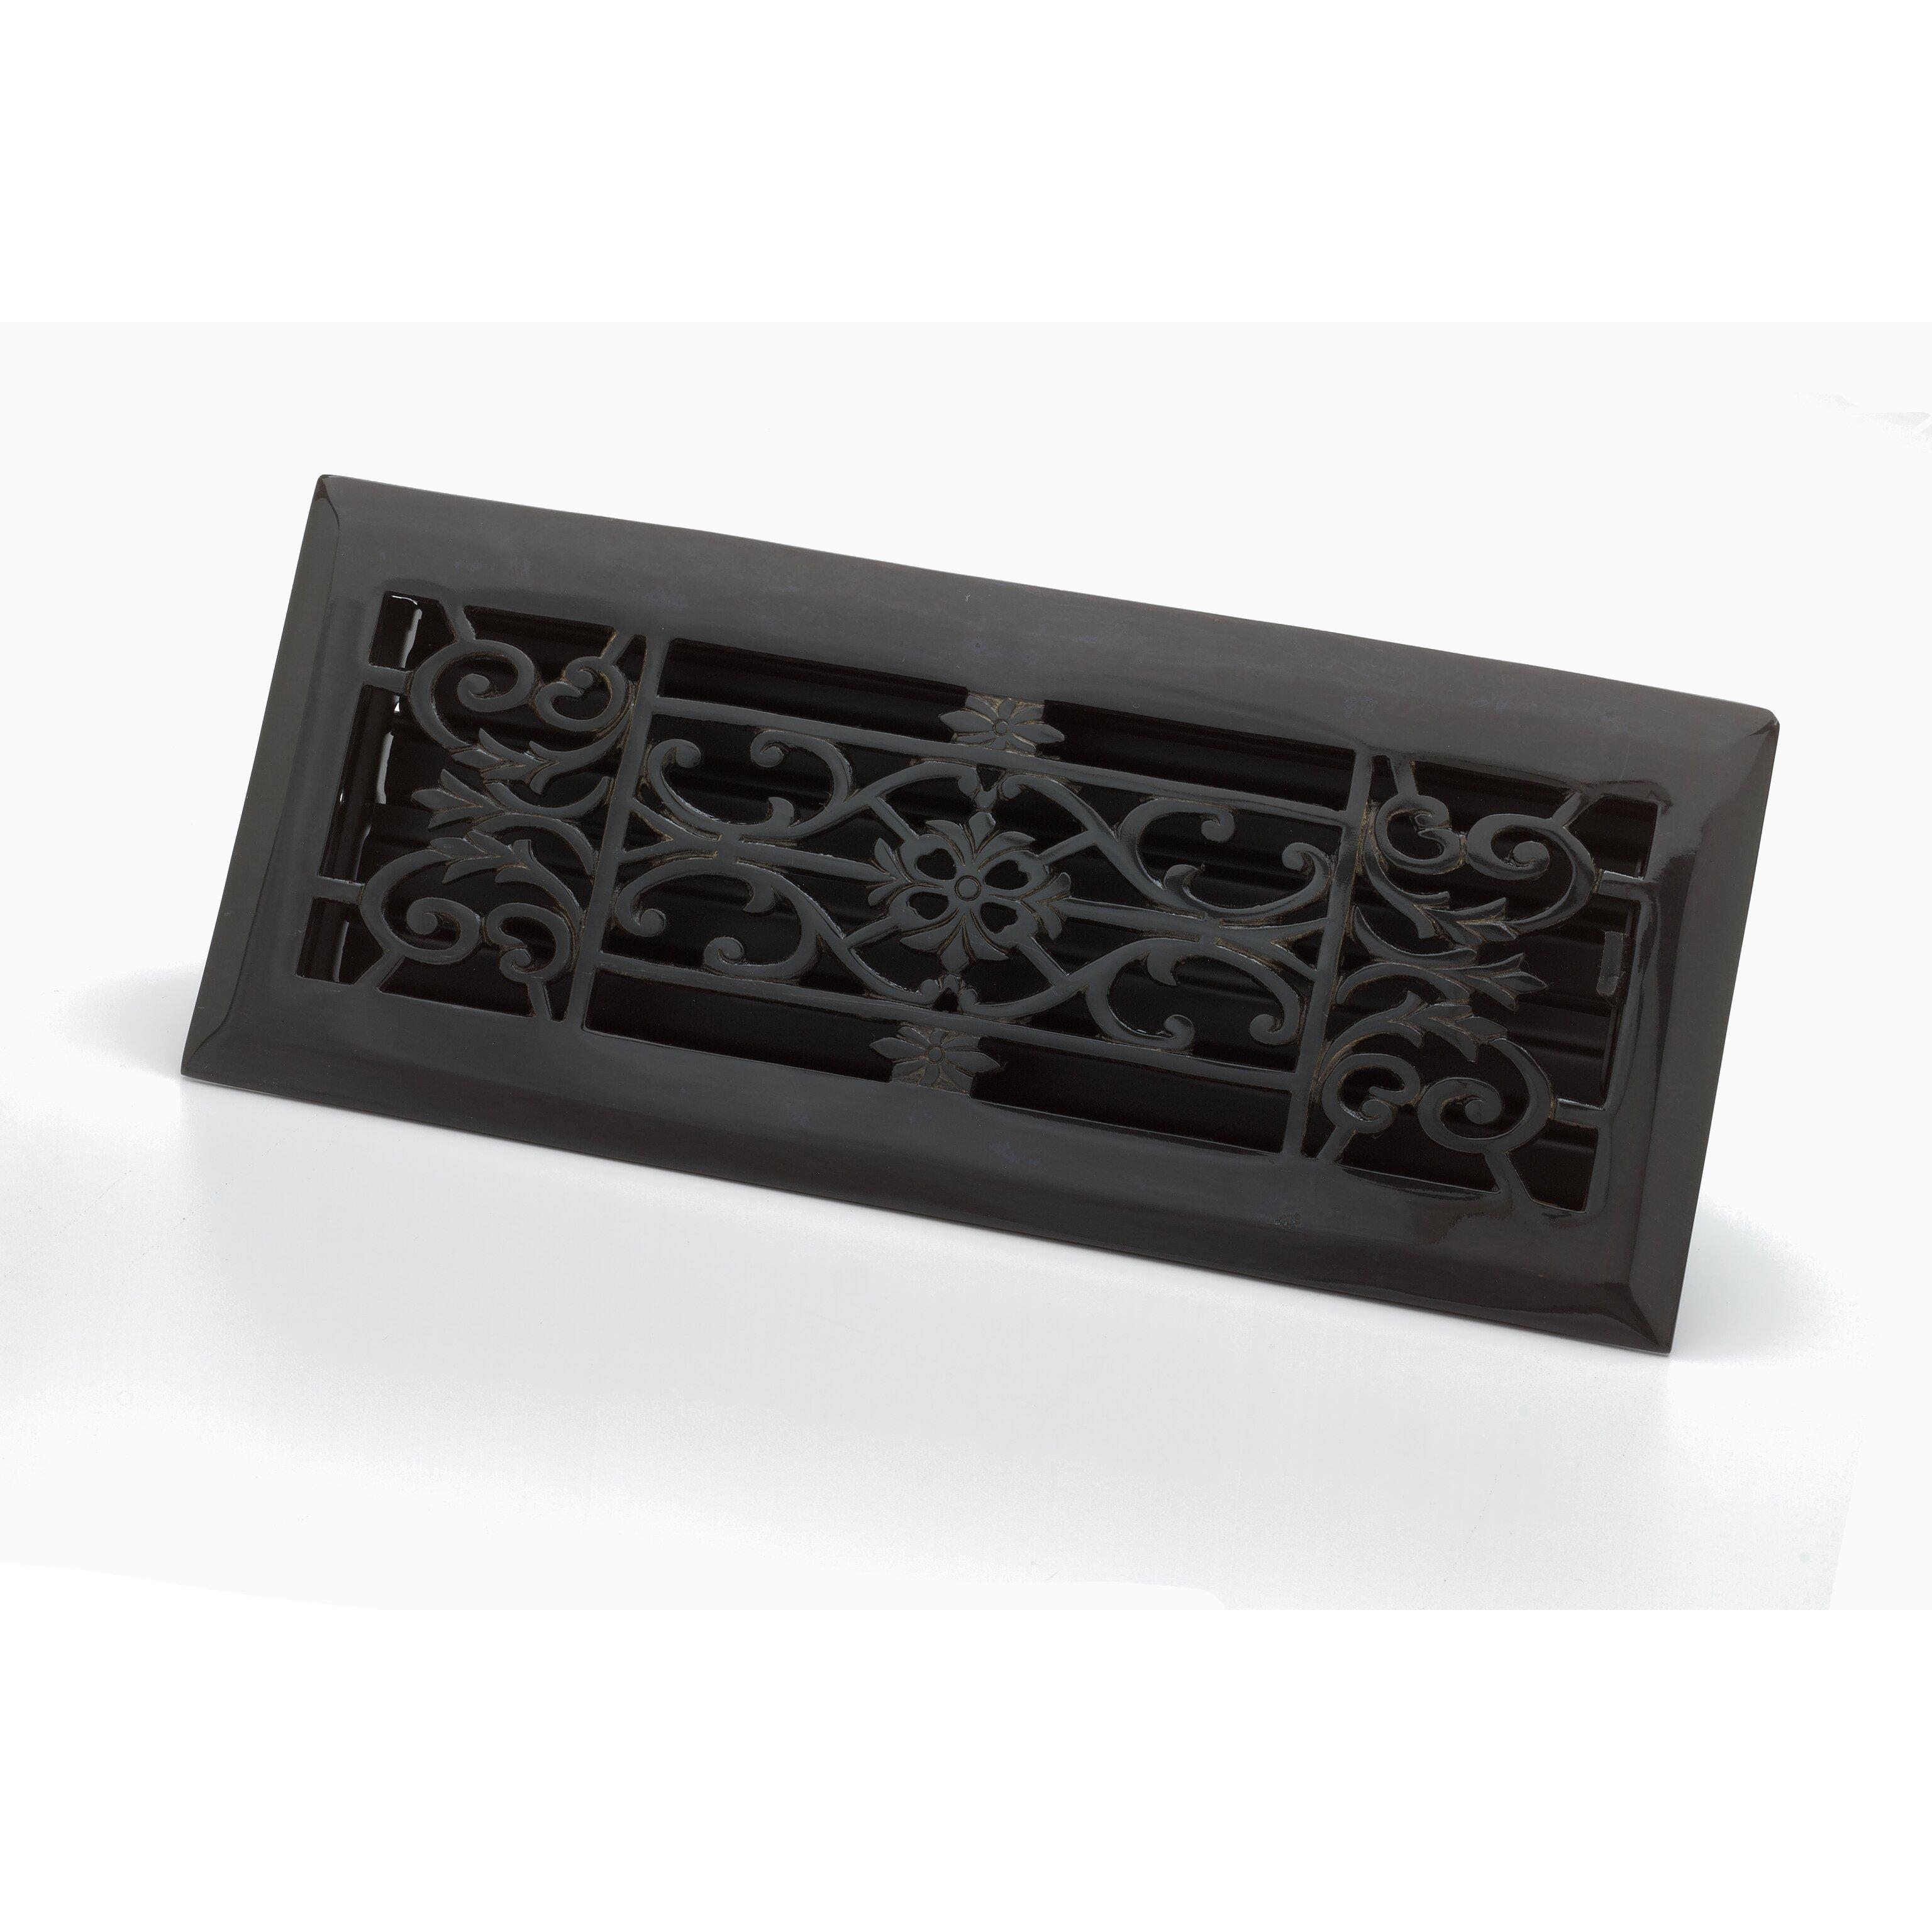 Zoroufy 4 x 12 decorative floor register reviews wayfair Decorative floor registers